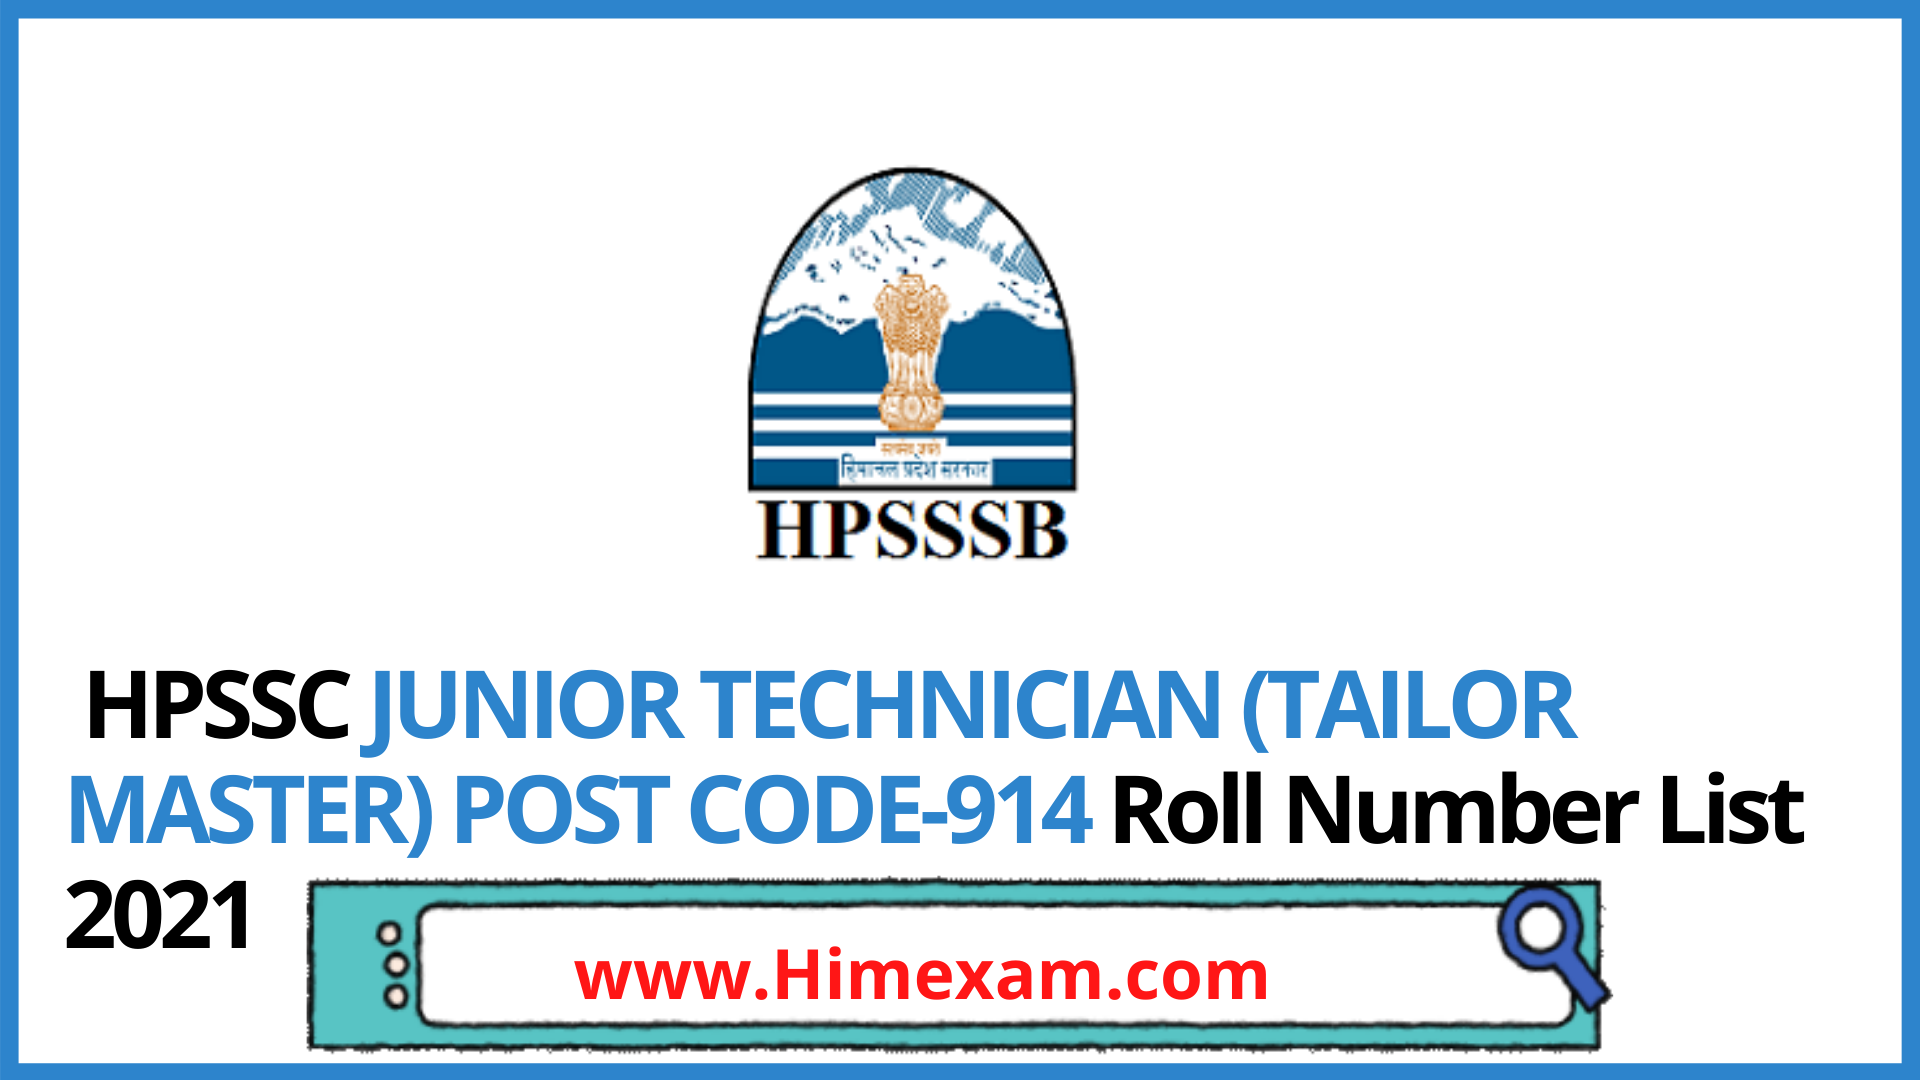 HPSSC JUNIOR TECHNICIAN (TAILOR MASTER) POST CODE-914 Roll Number List 2021